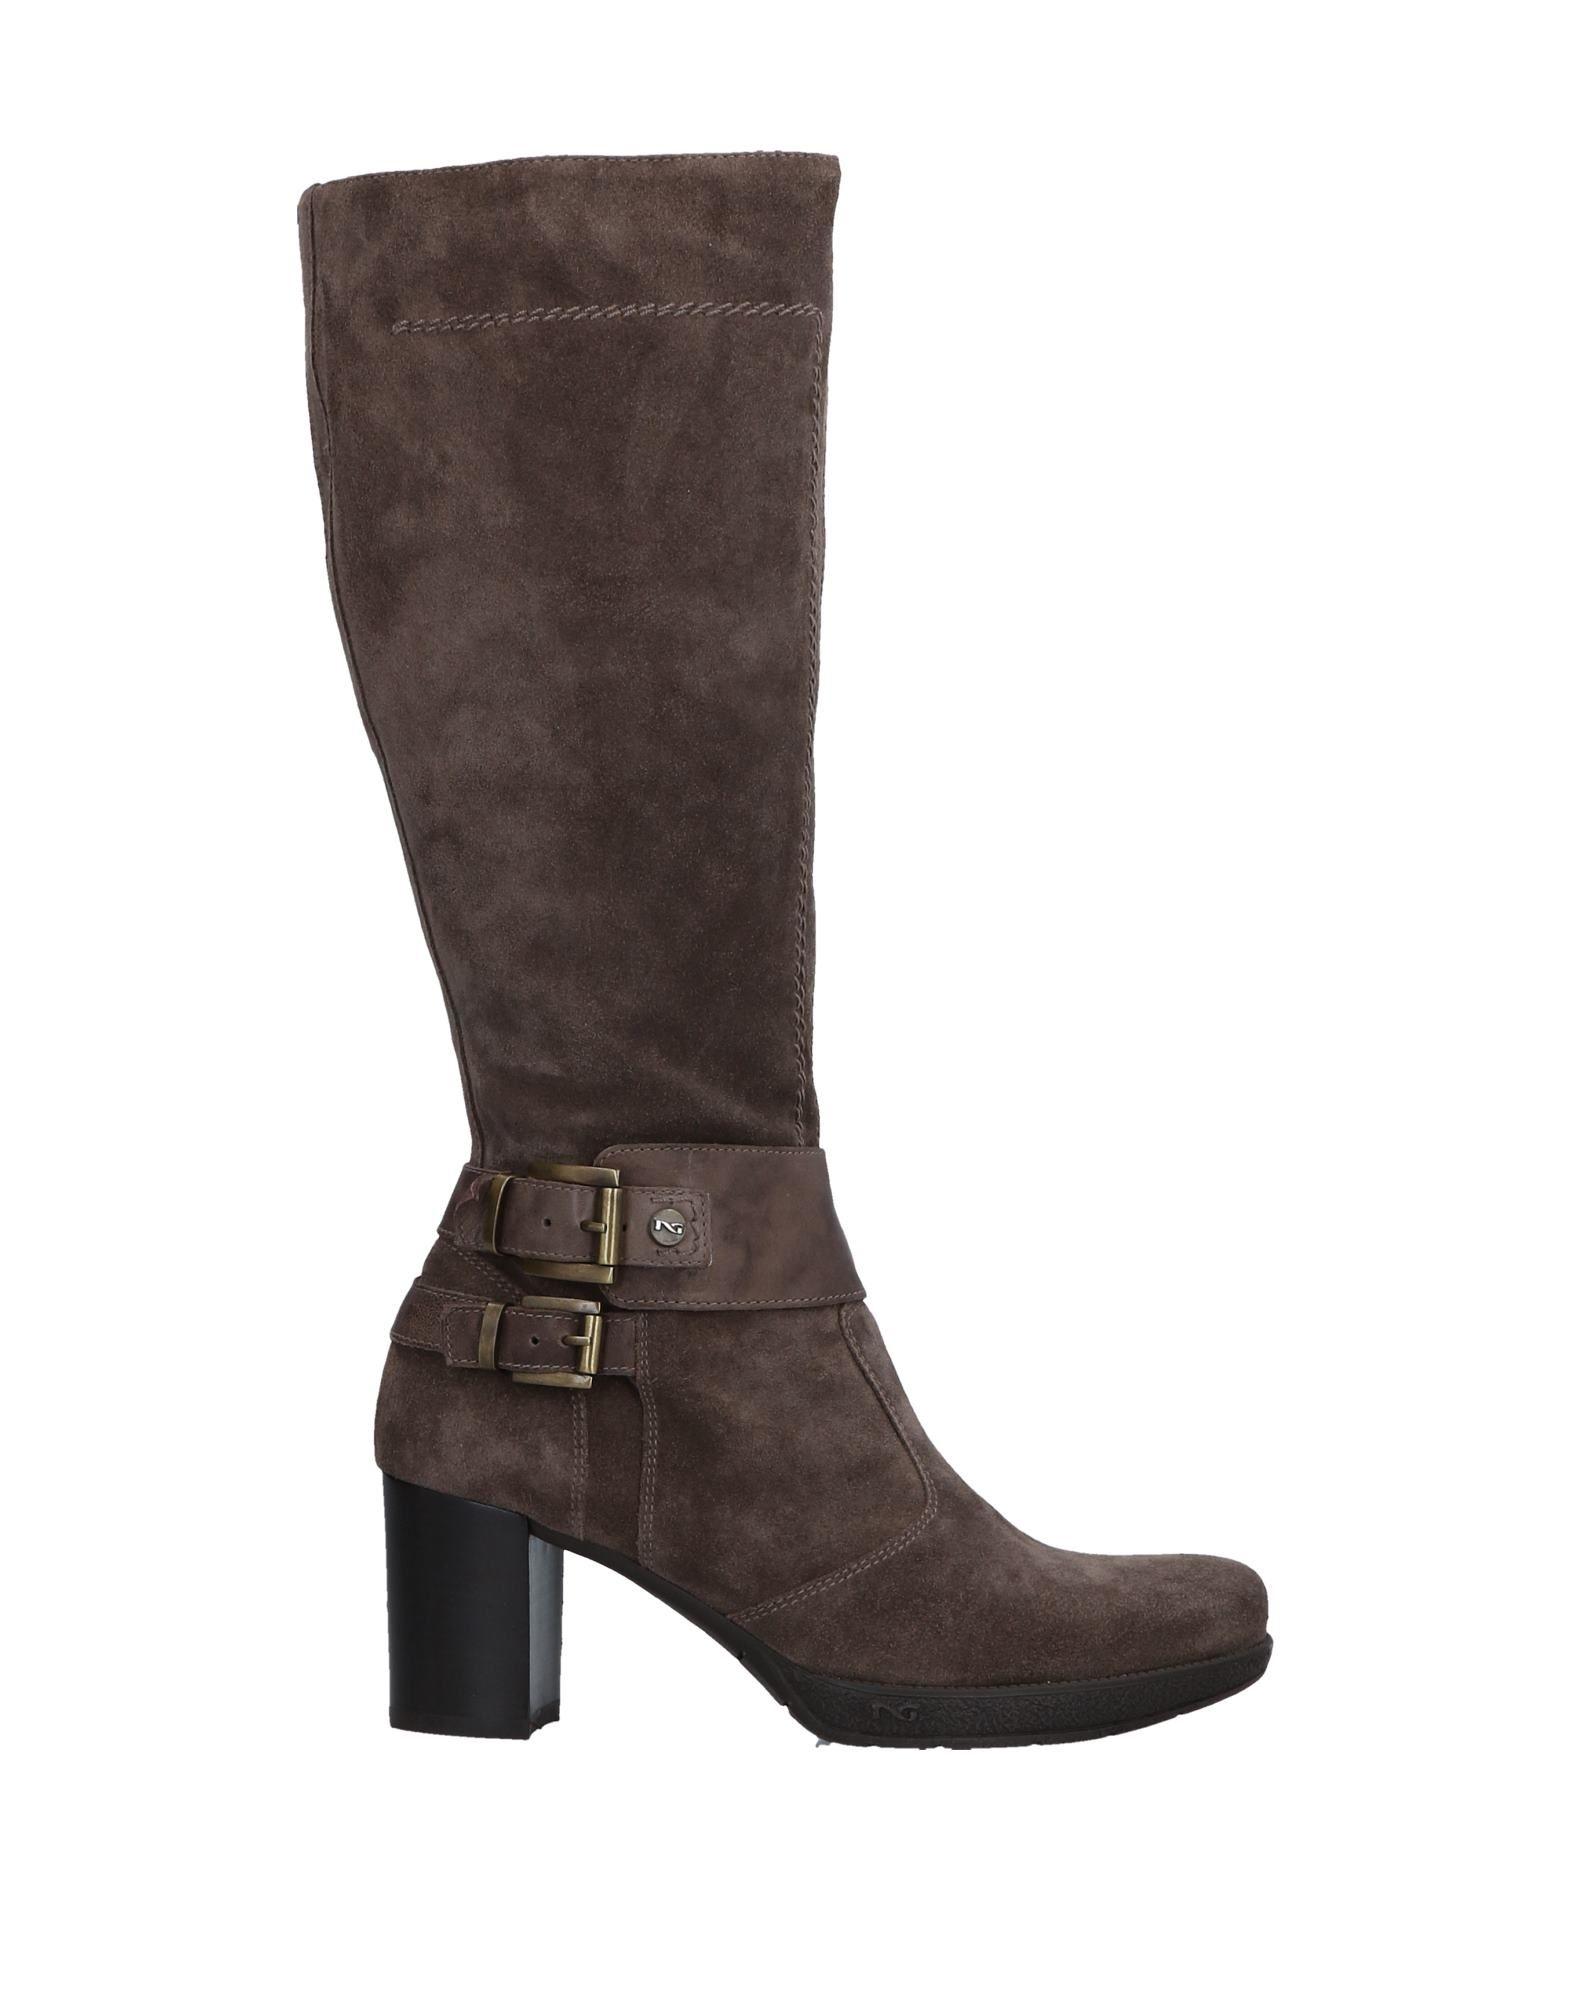 Ng Nero Giardini Stiefel Damen  11540766VU Gute Qualität beliebte Schuhe